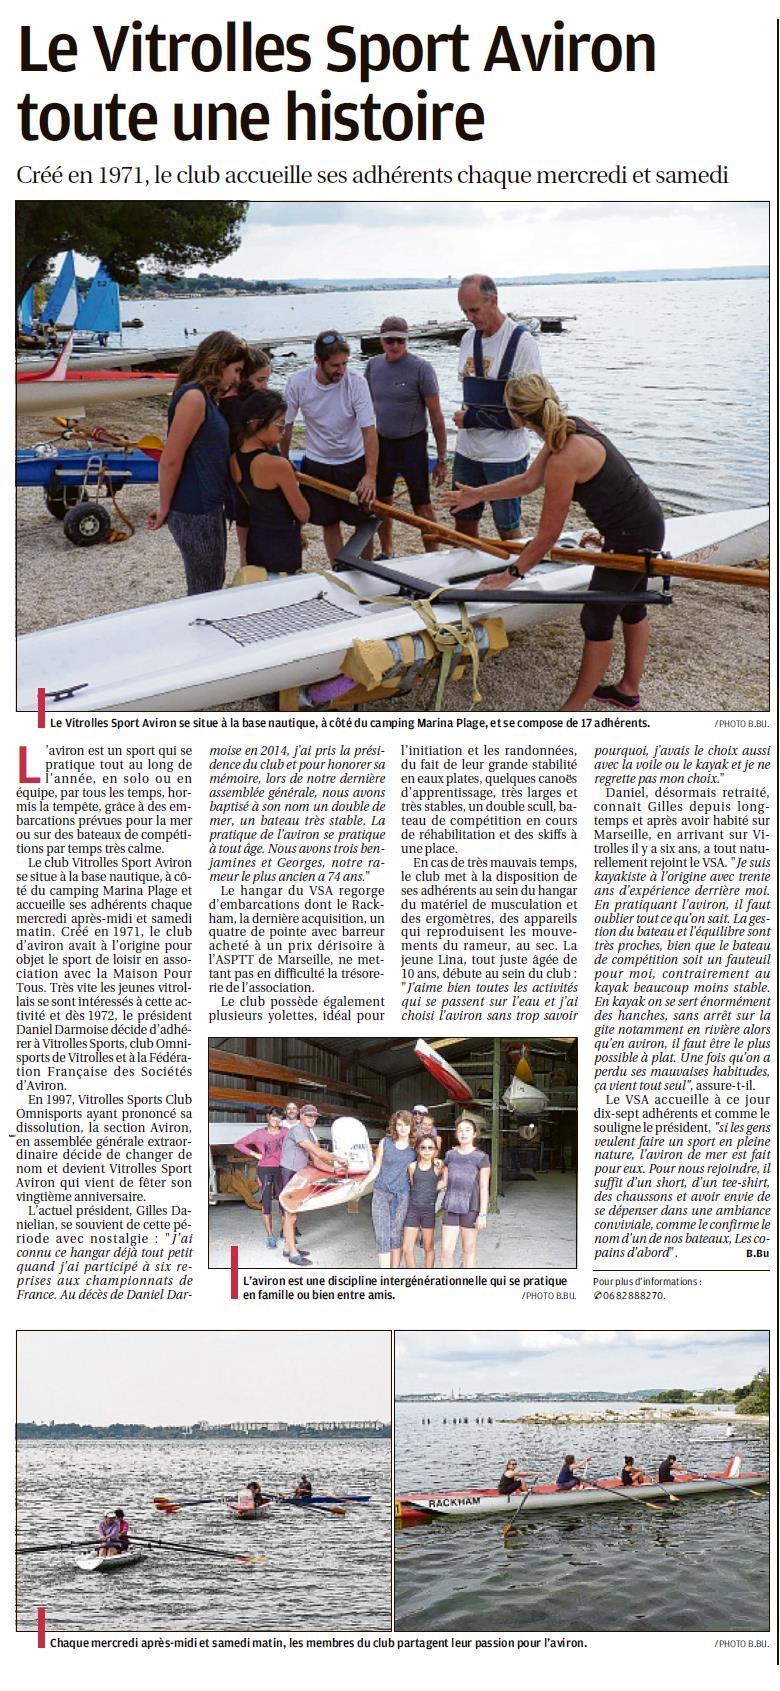 Article de la Provence club d'aviron de Vitrolles